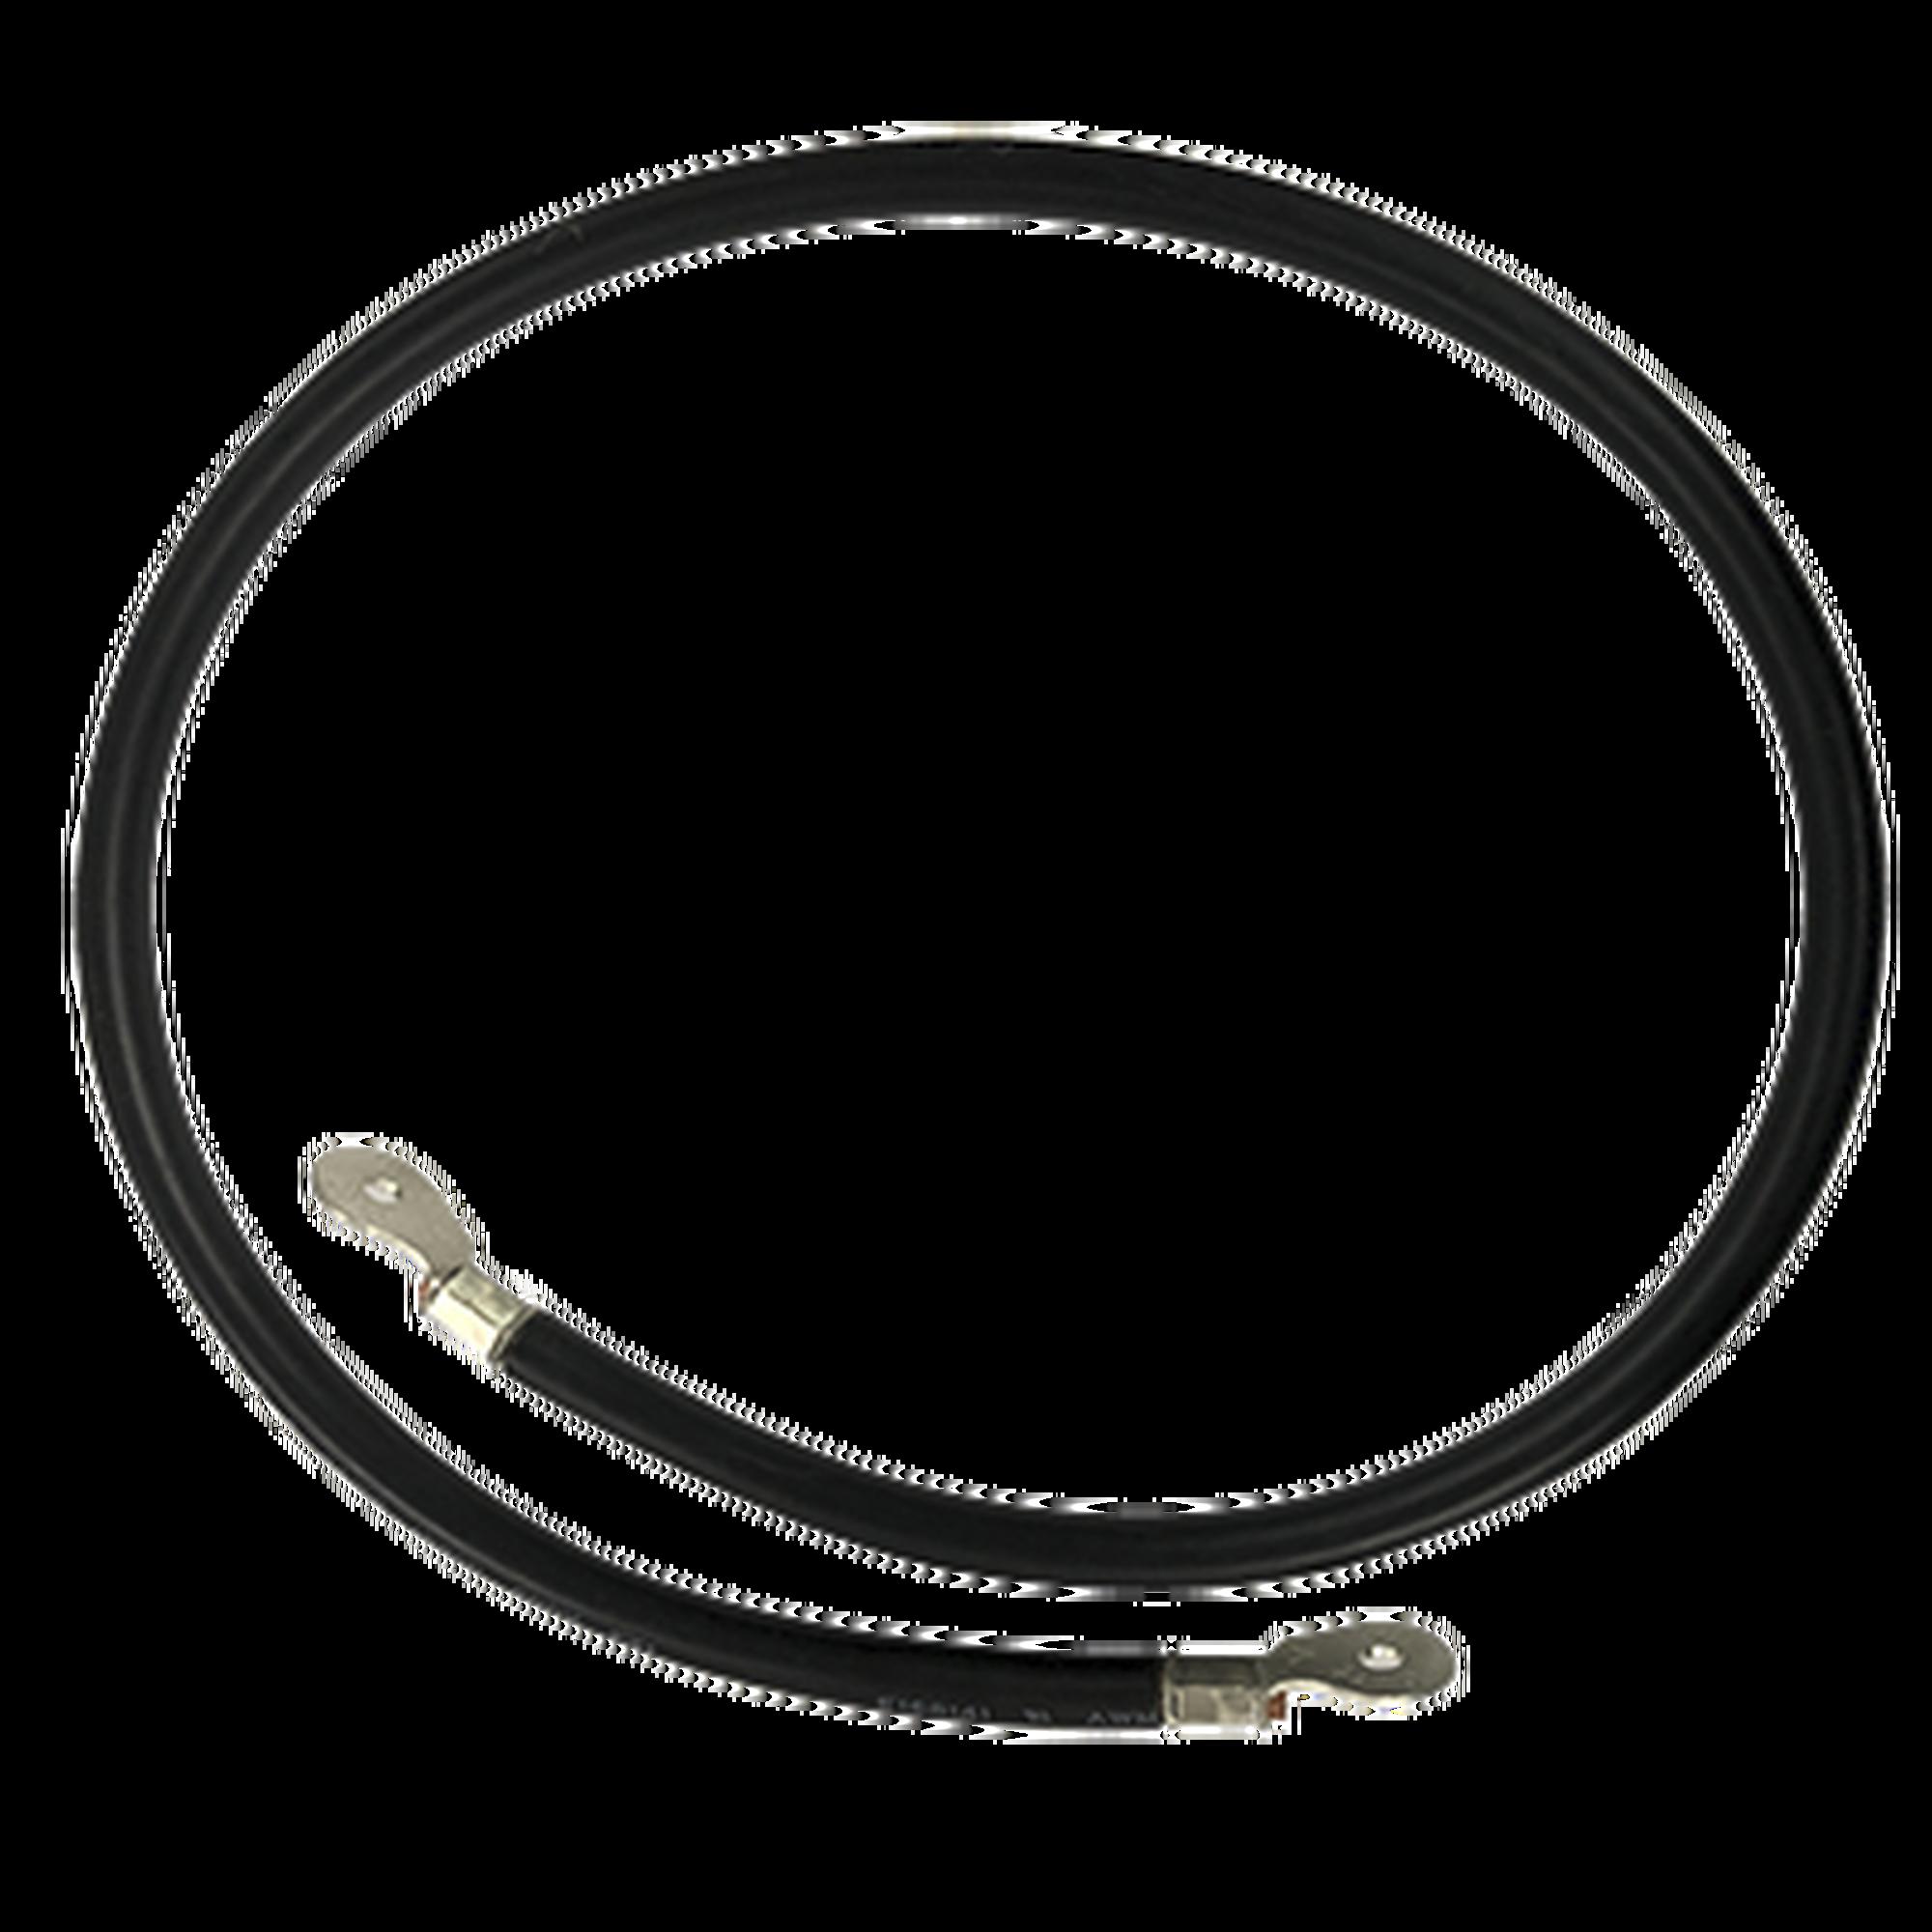 Cable para Baterías, 1 m, Negro, Calibre 2 AWG con Terminales de Ojo en Ambos Extremos